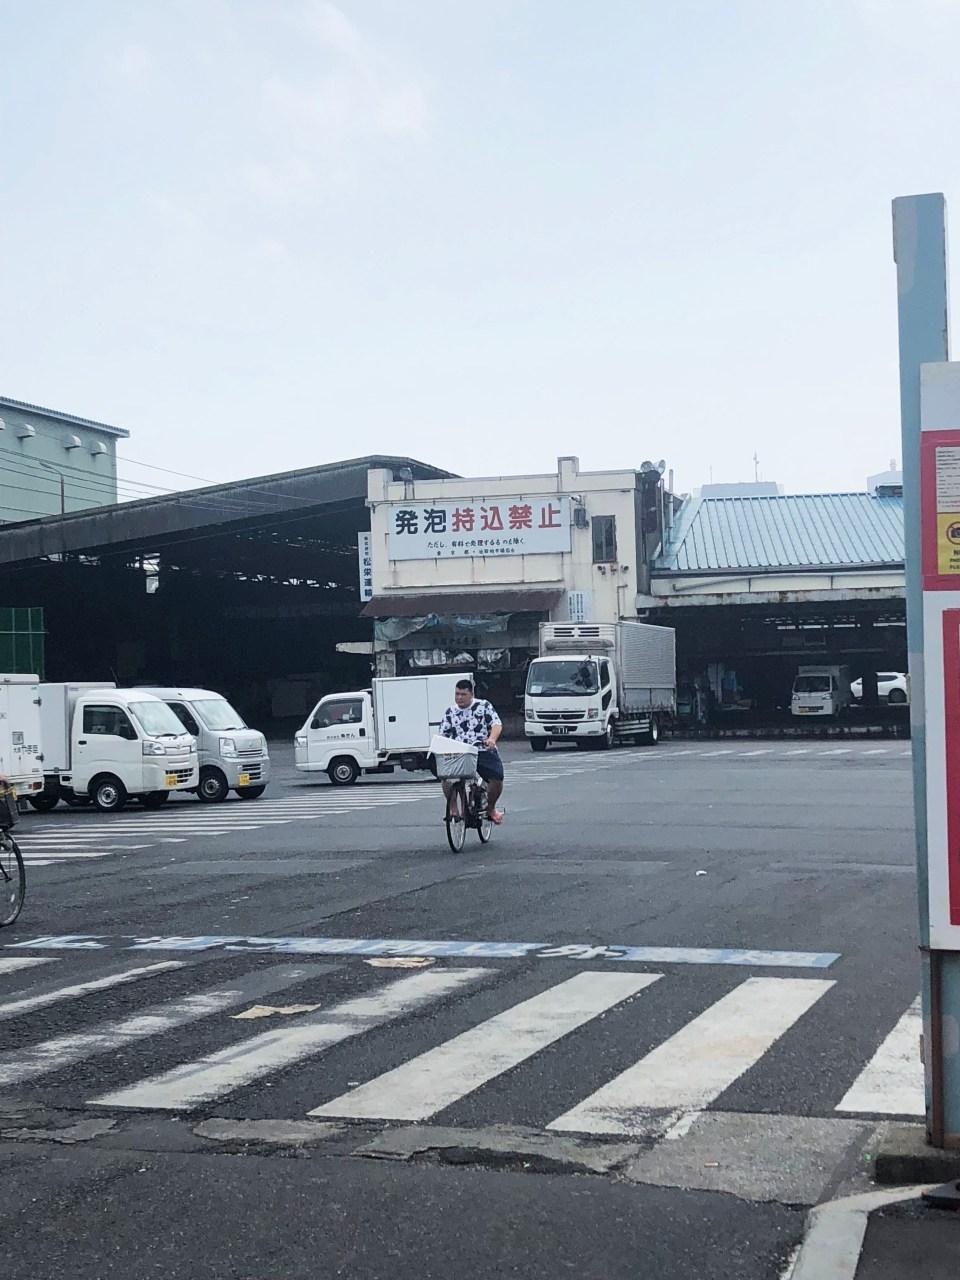 Old Tsukij Fish Market